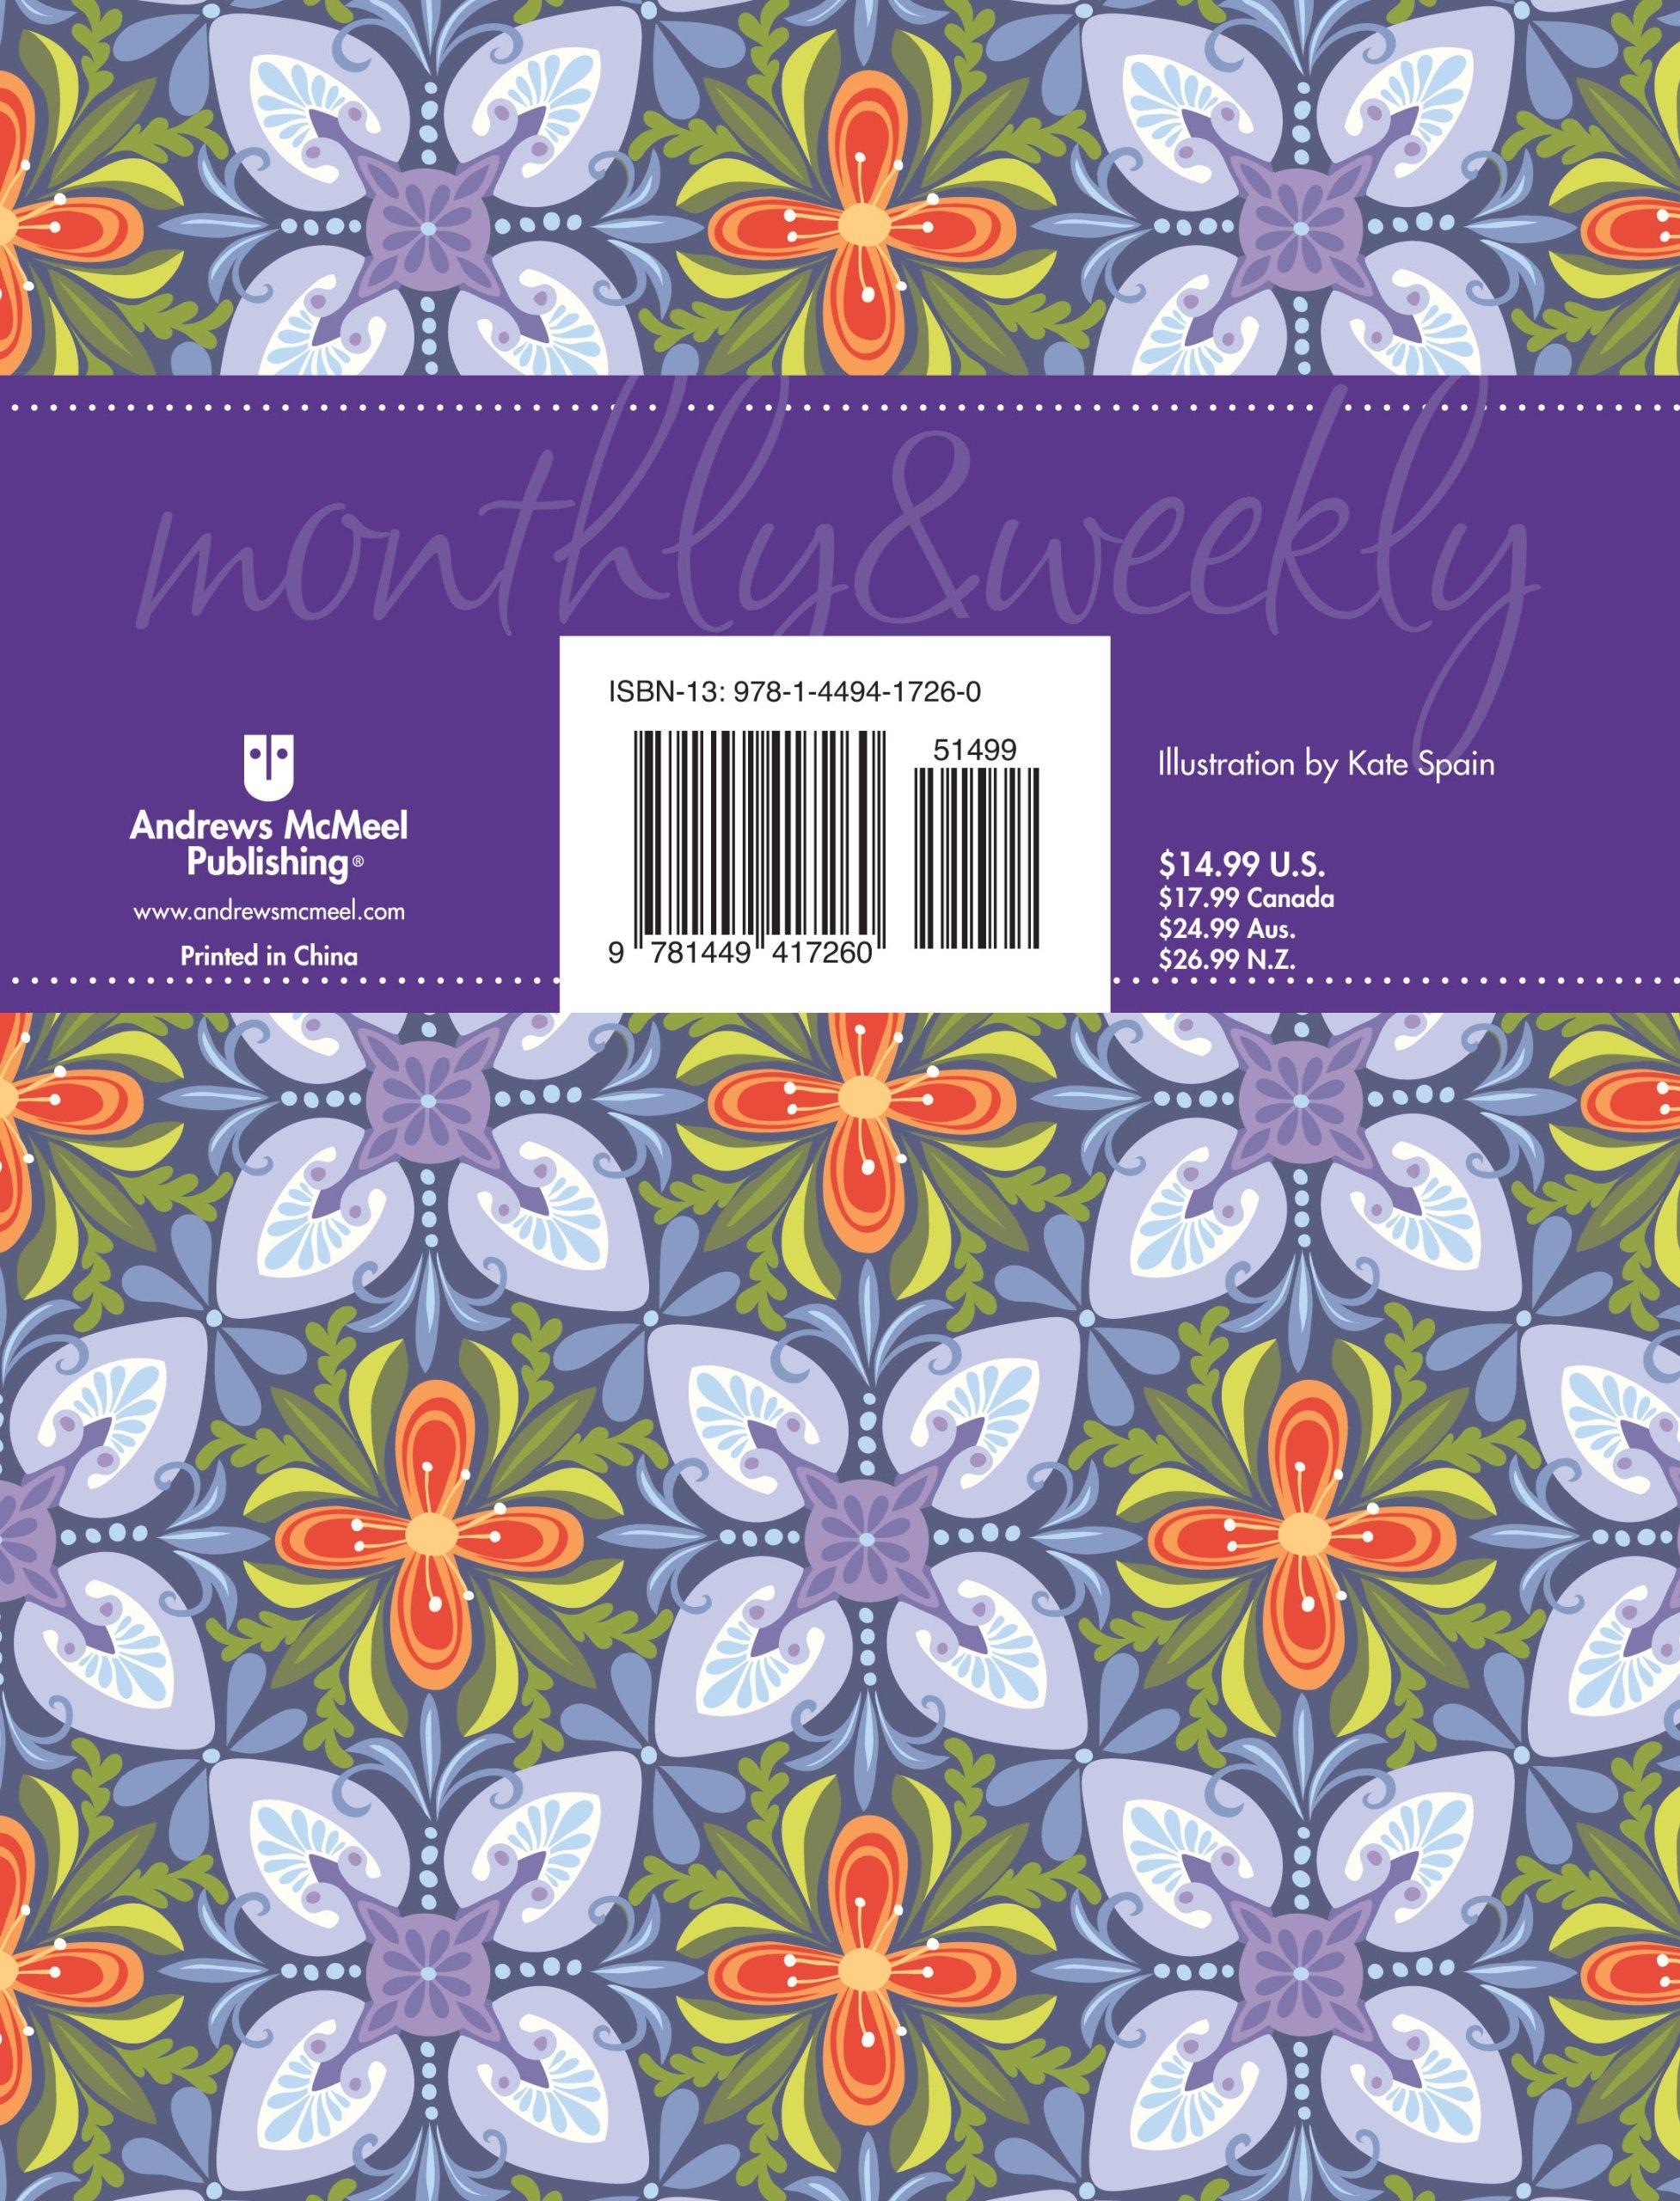 Posh: Kaleidoscope 2013 Monthly/Weekly Planner Calendar.